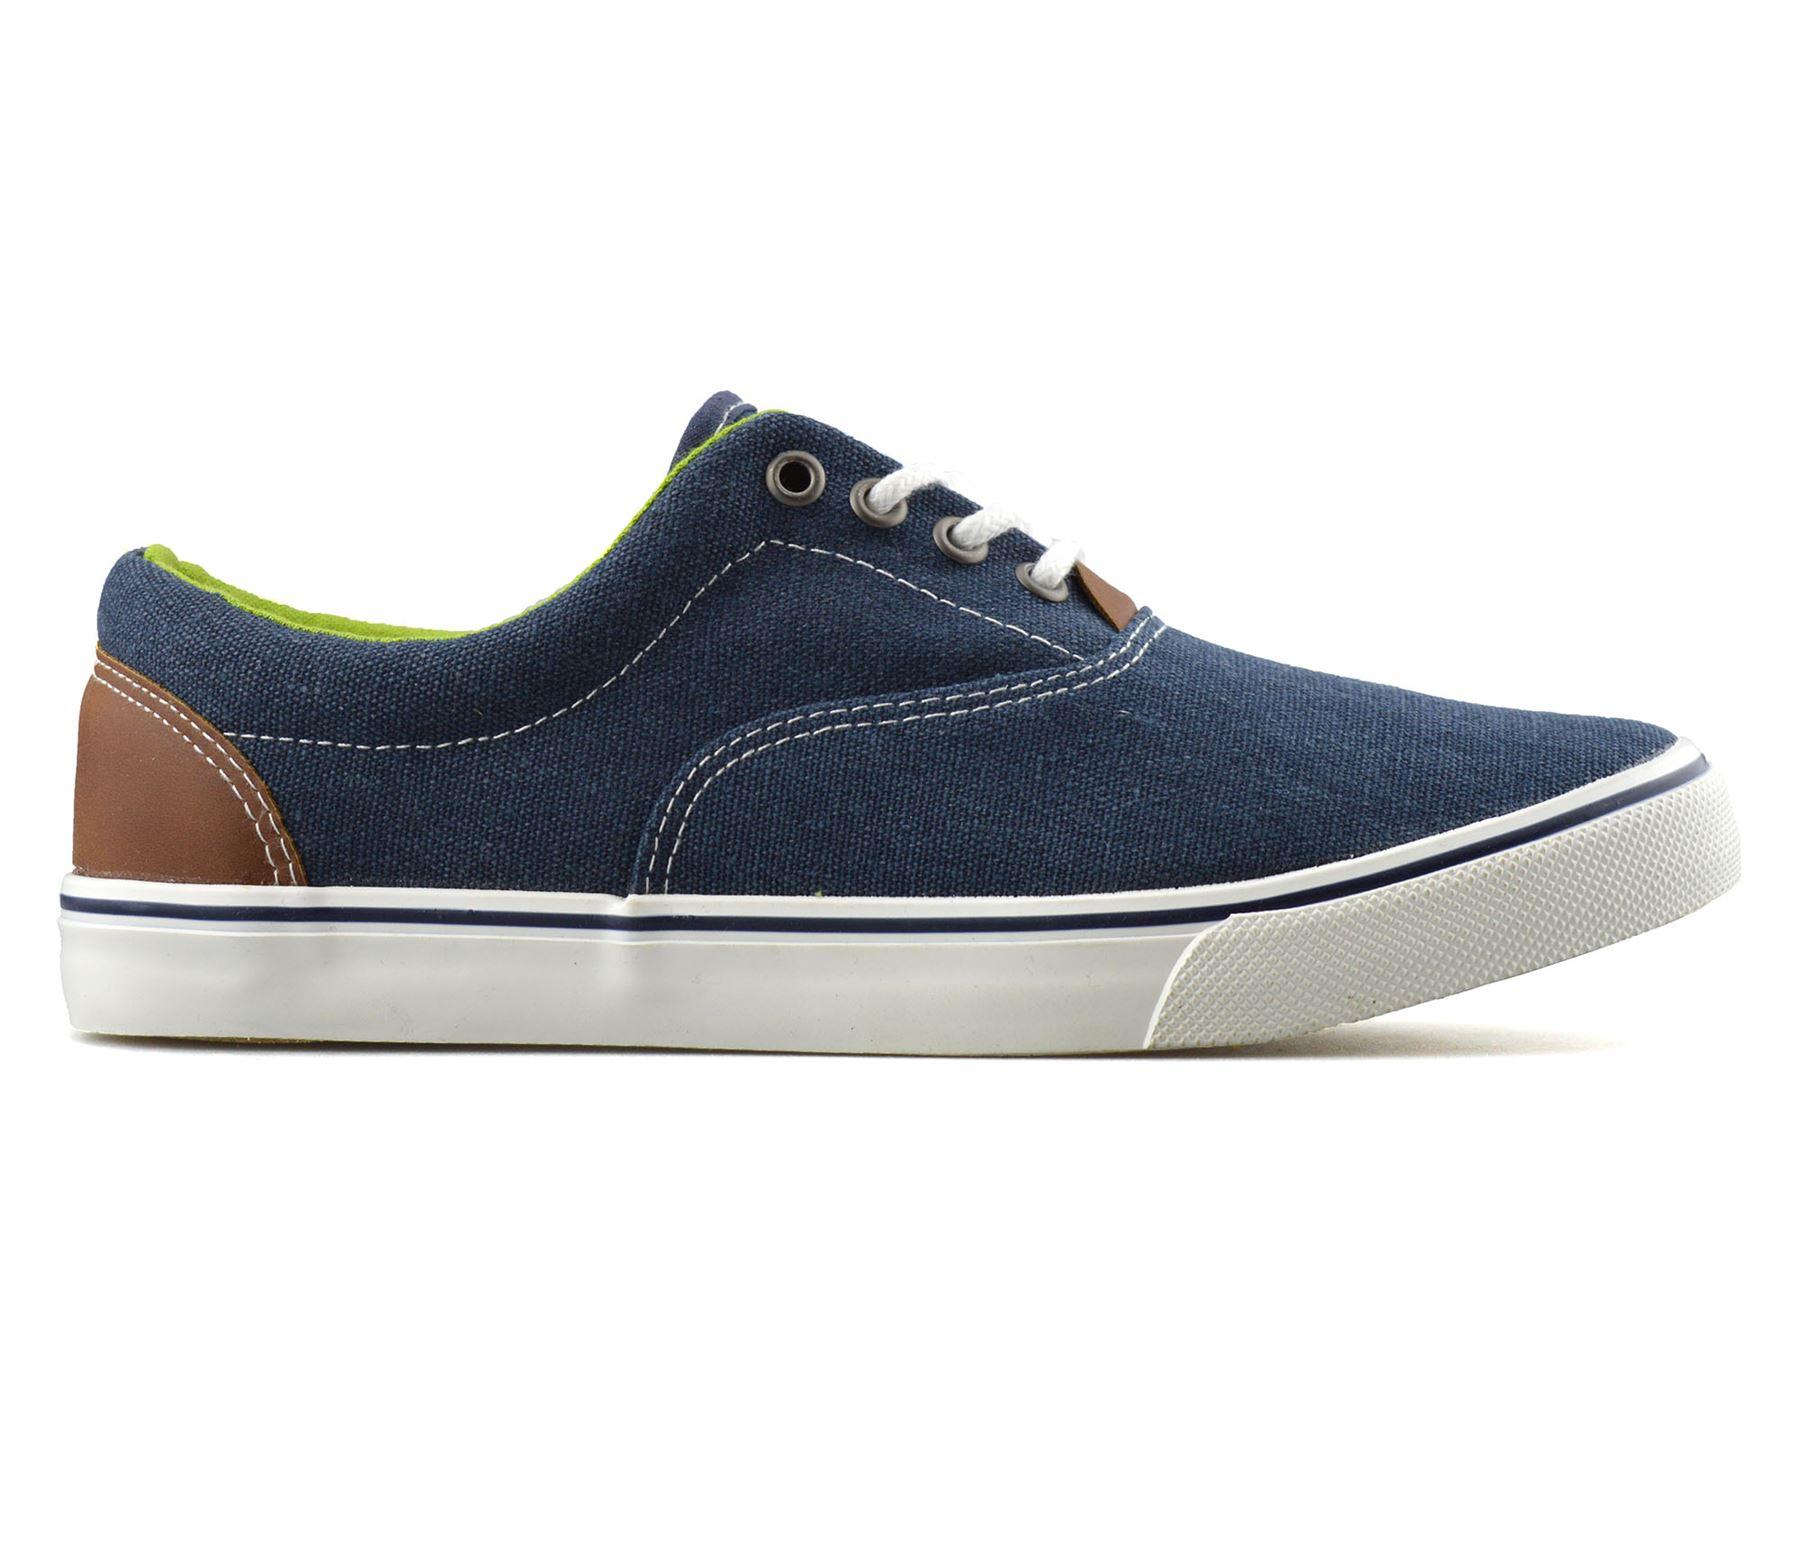 Mens-Casual-Flat-Lace-Up-Canvas-Skate-Pumps-Walking-Plimsolls-Trainers-Shoe-Size thumbnail 13